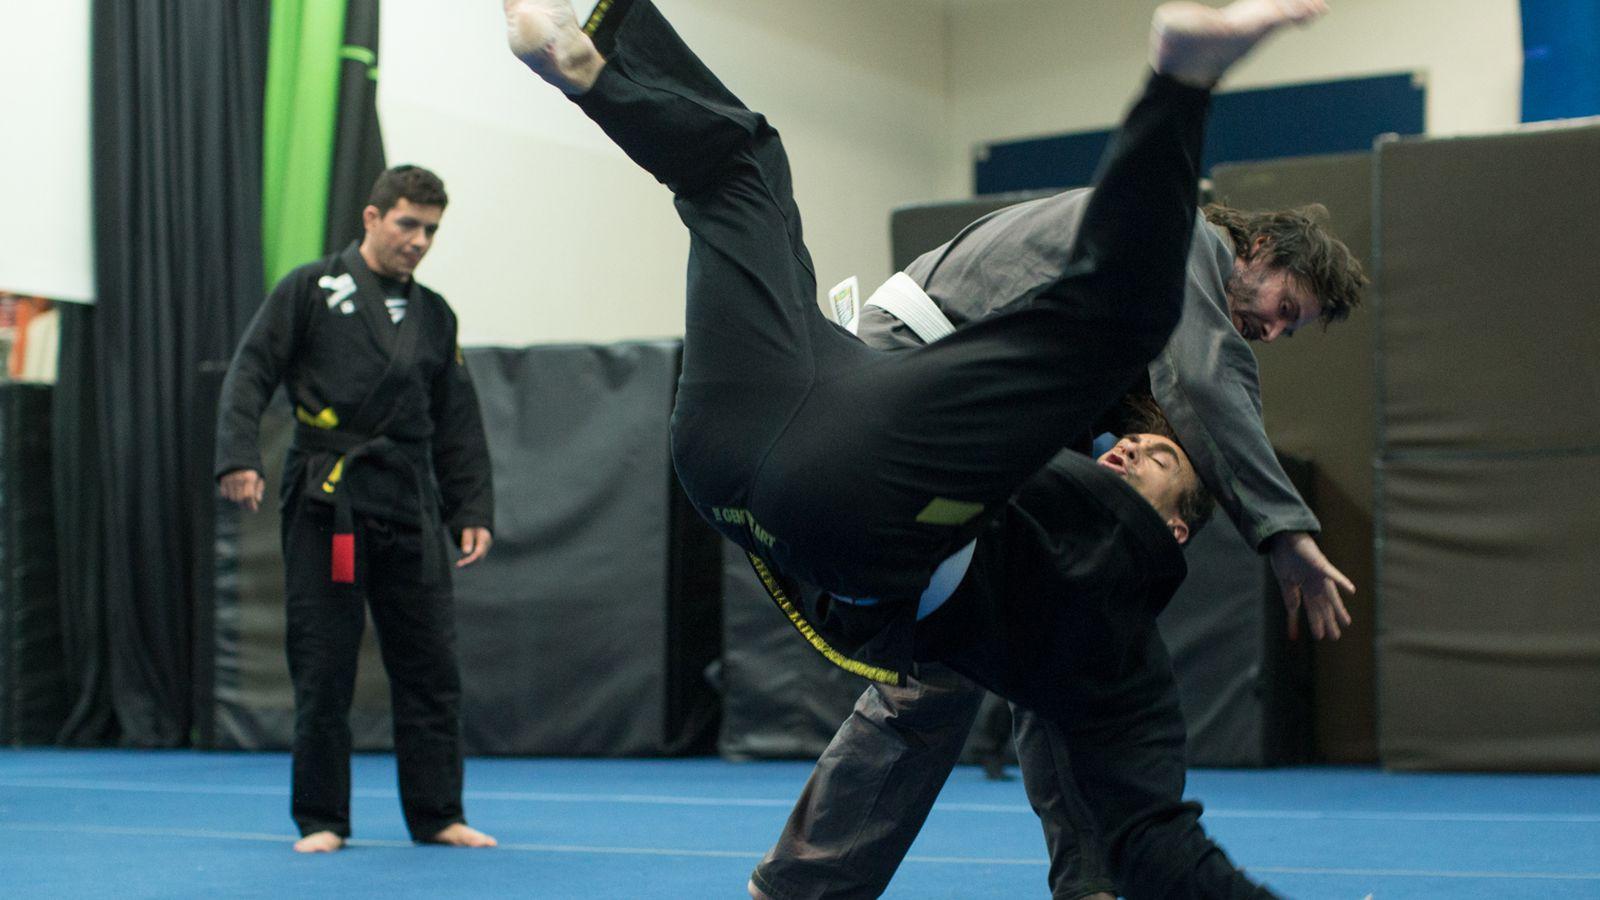 Keanu Reeves training jiu-jitsu photos - MMA Fighting